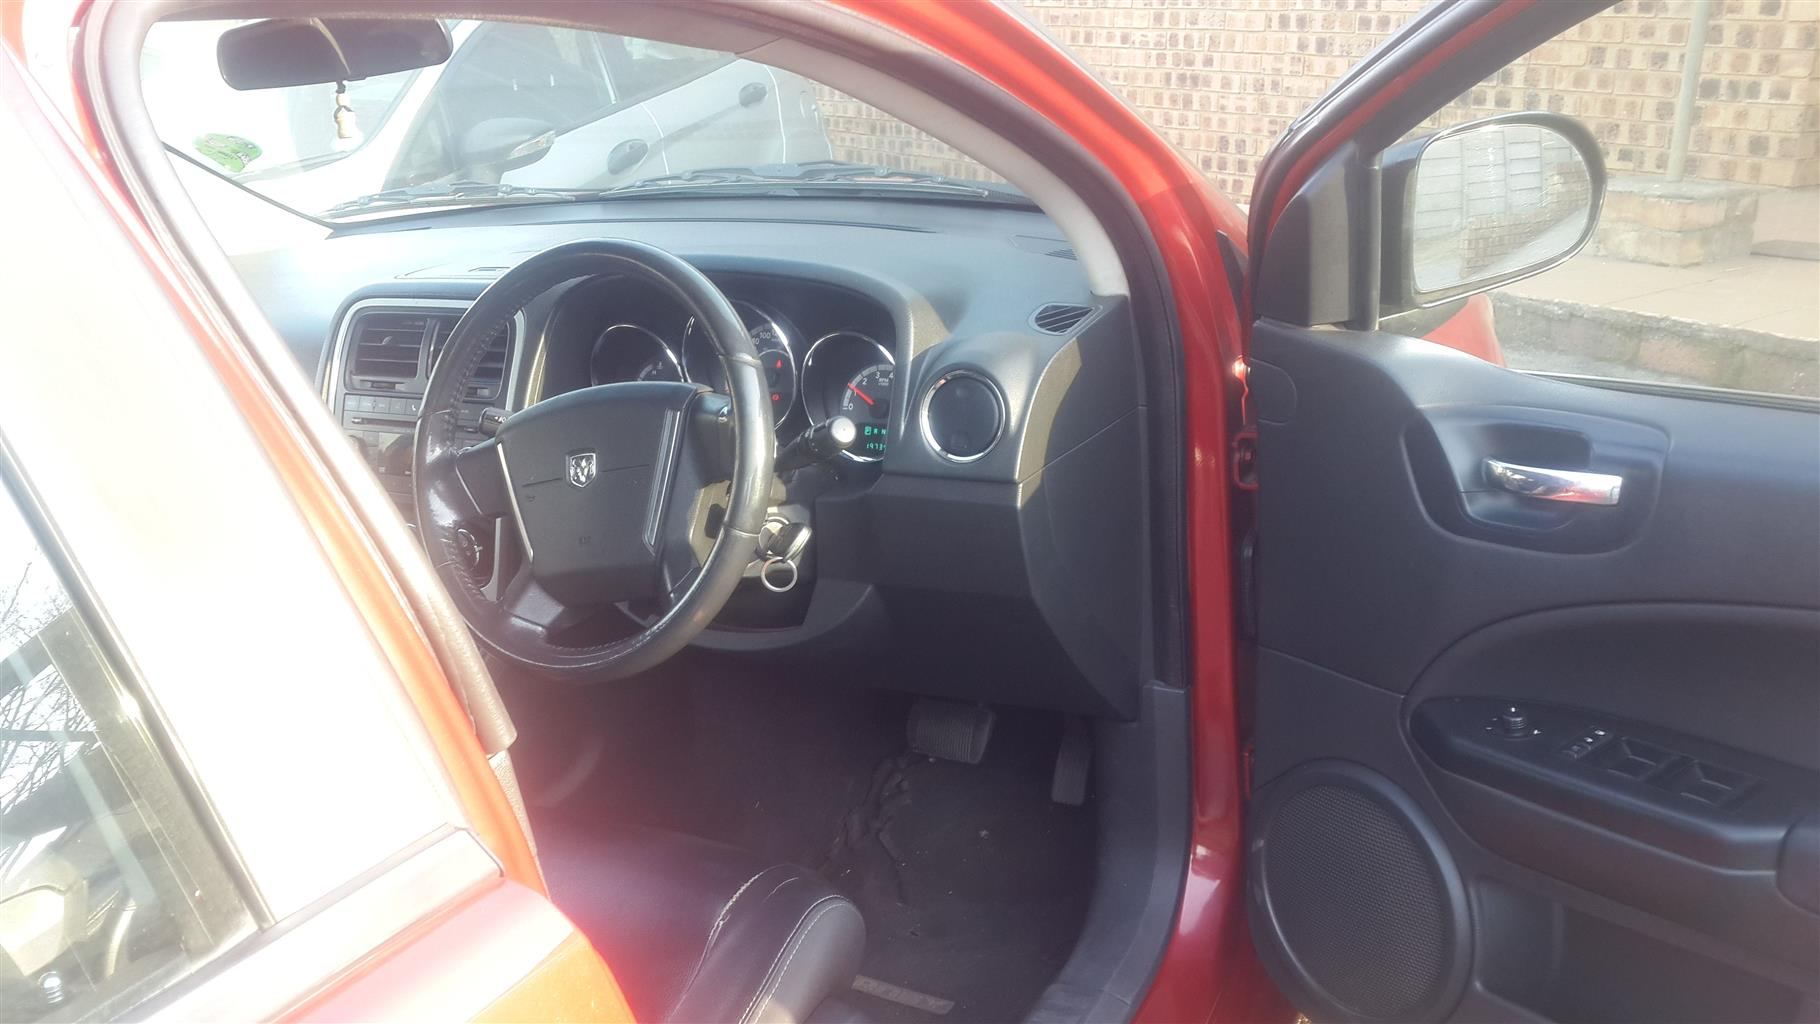 2010 Dodge Caliber 2.0 SXT auto